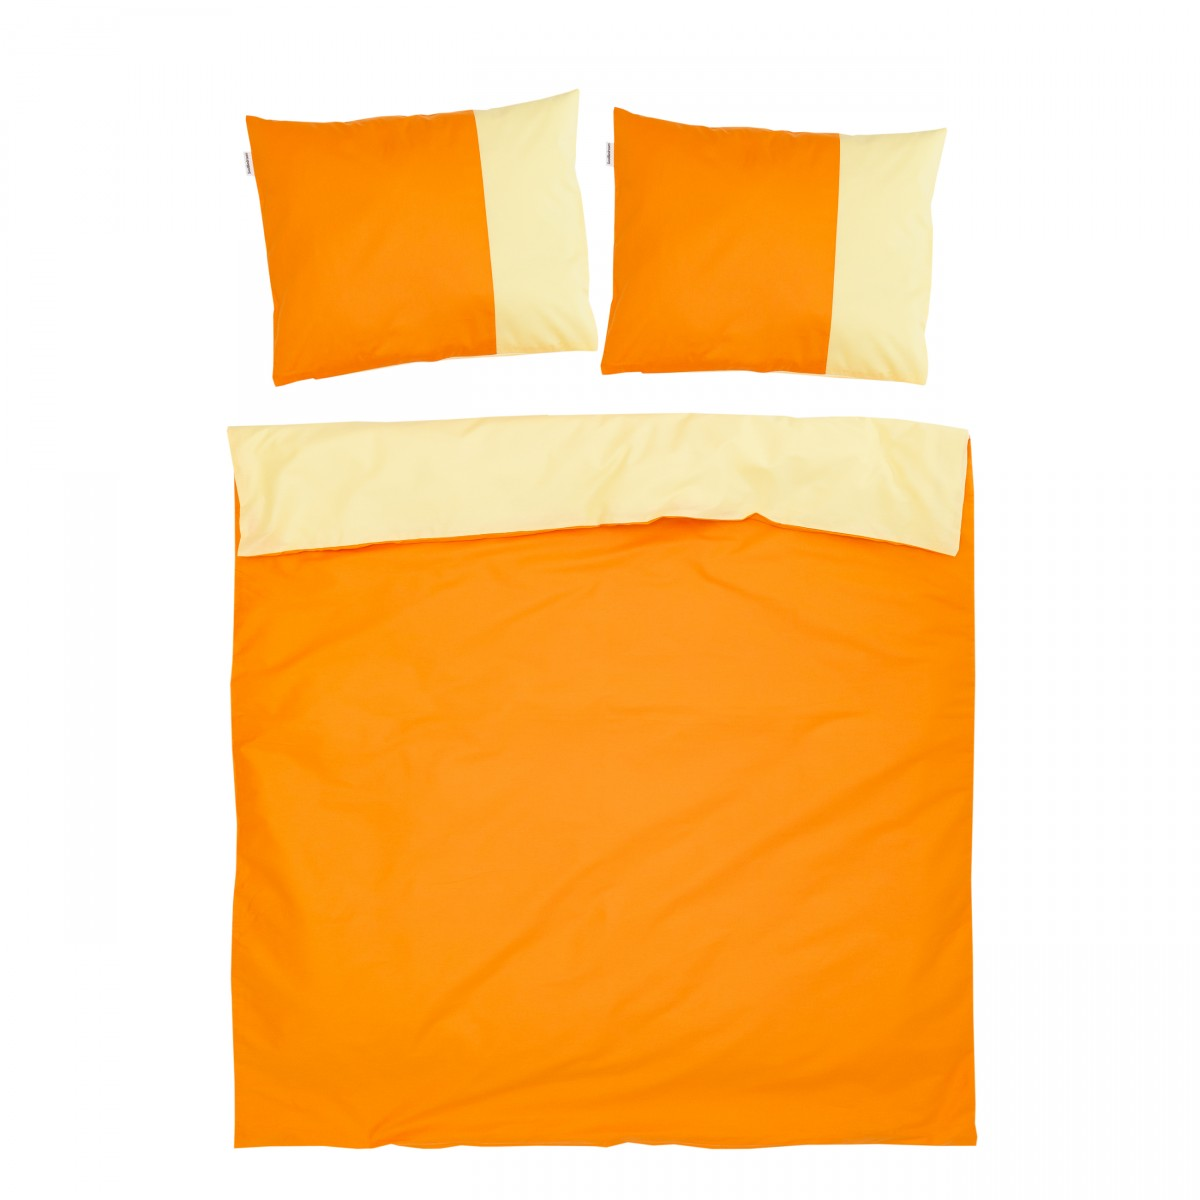 Orange And Yellow 100 Cotton Bed Linen Set Reversible Duvet Cover Pillow Cases Soulbedroom Eurl